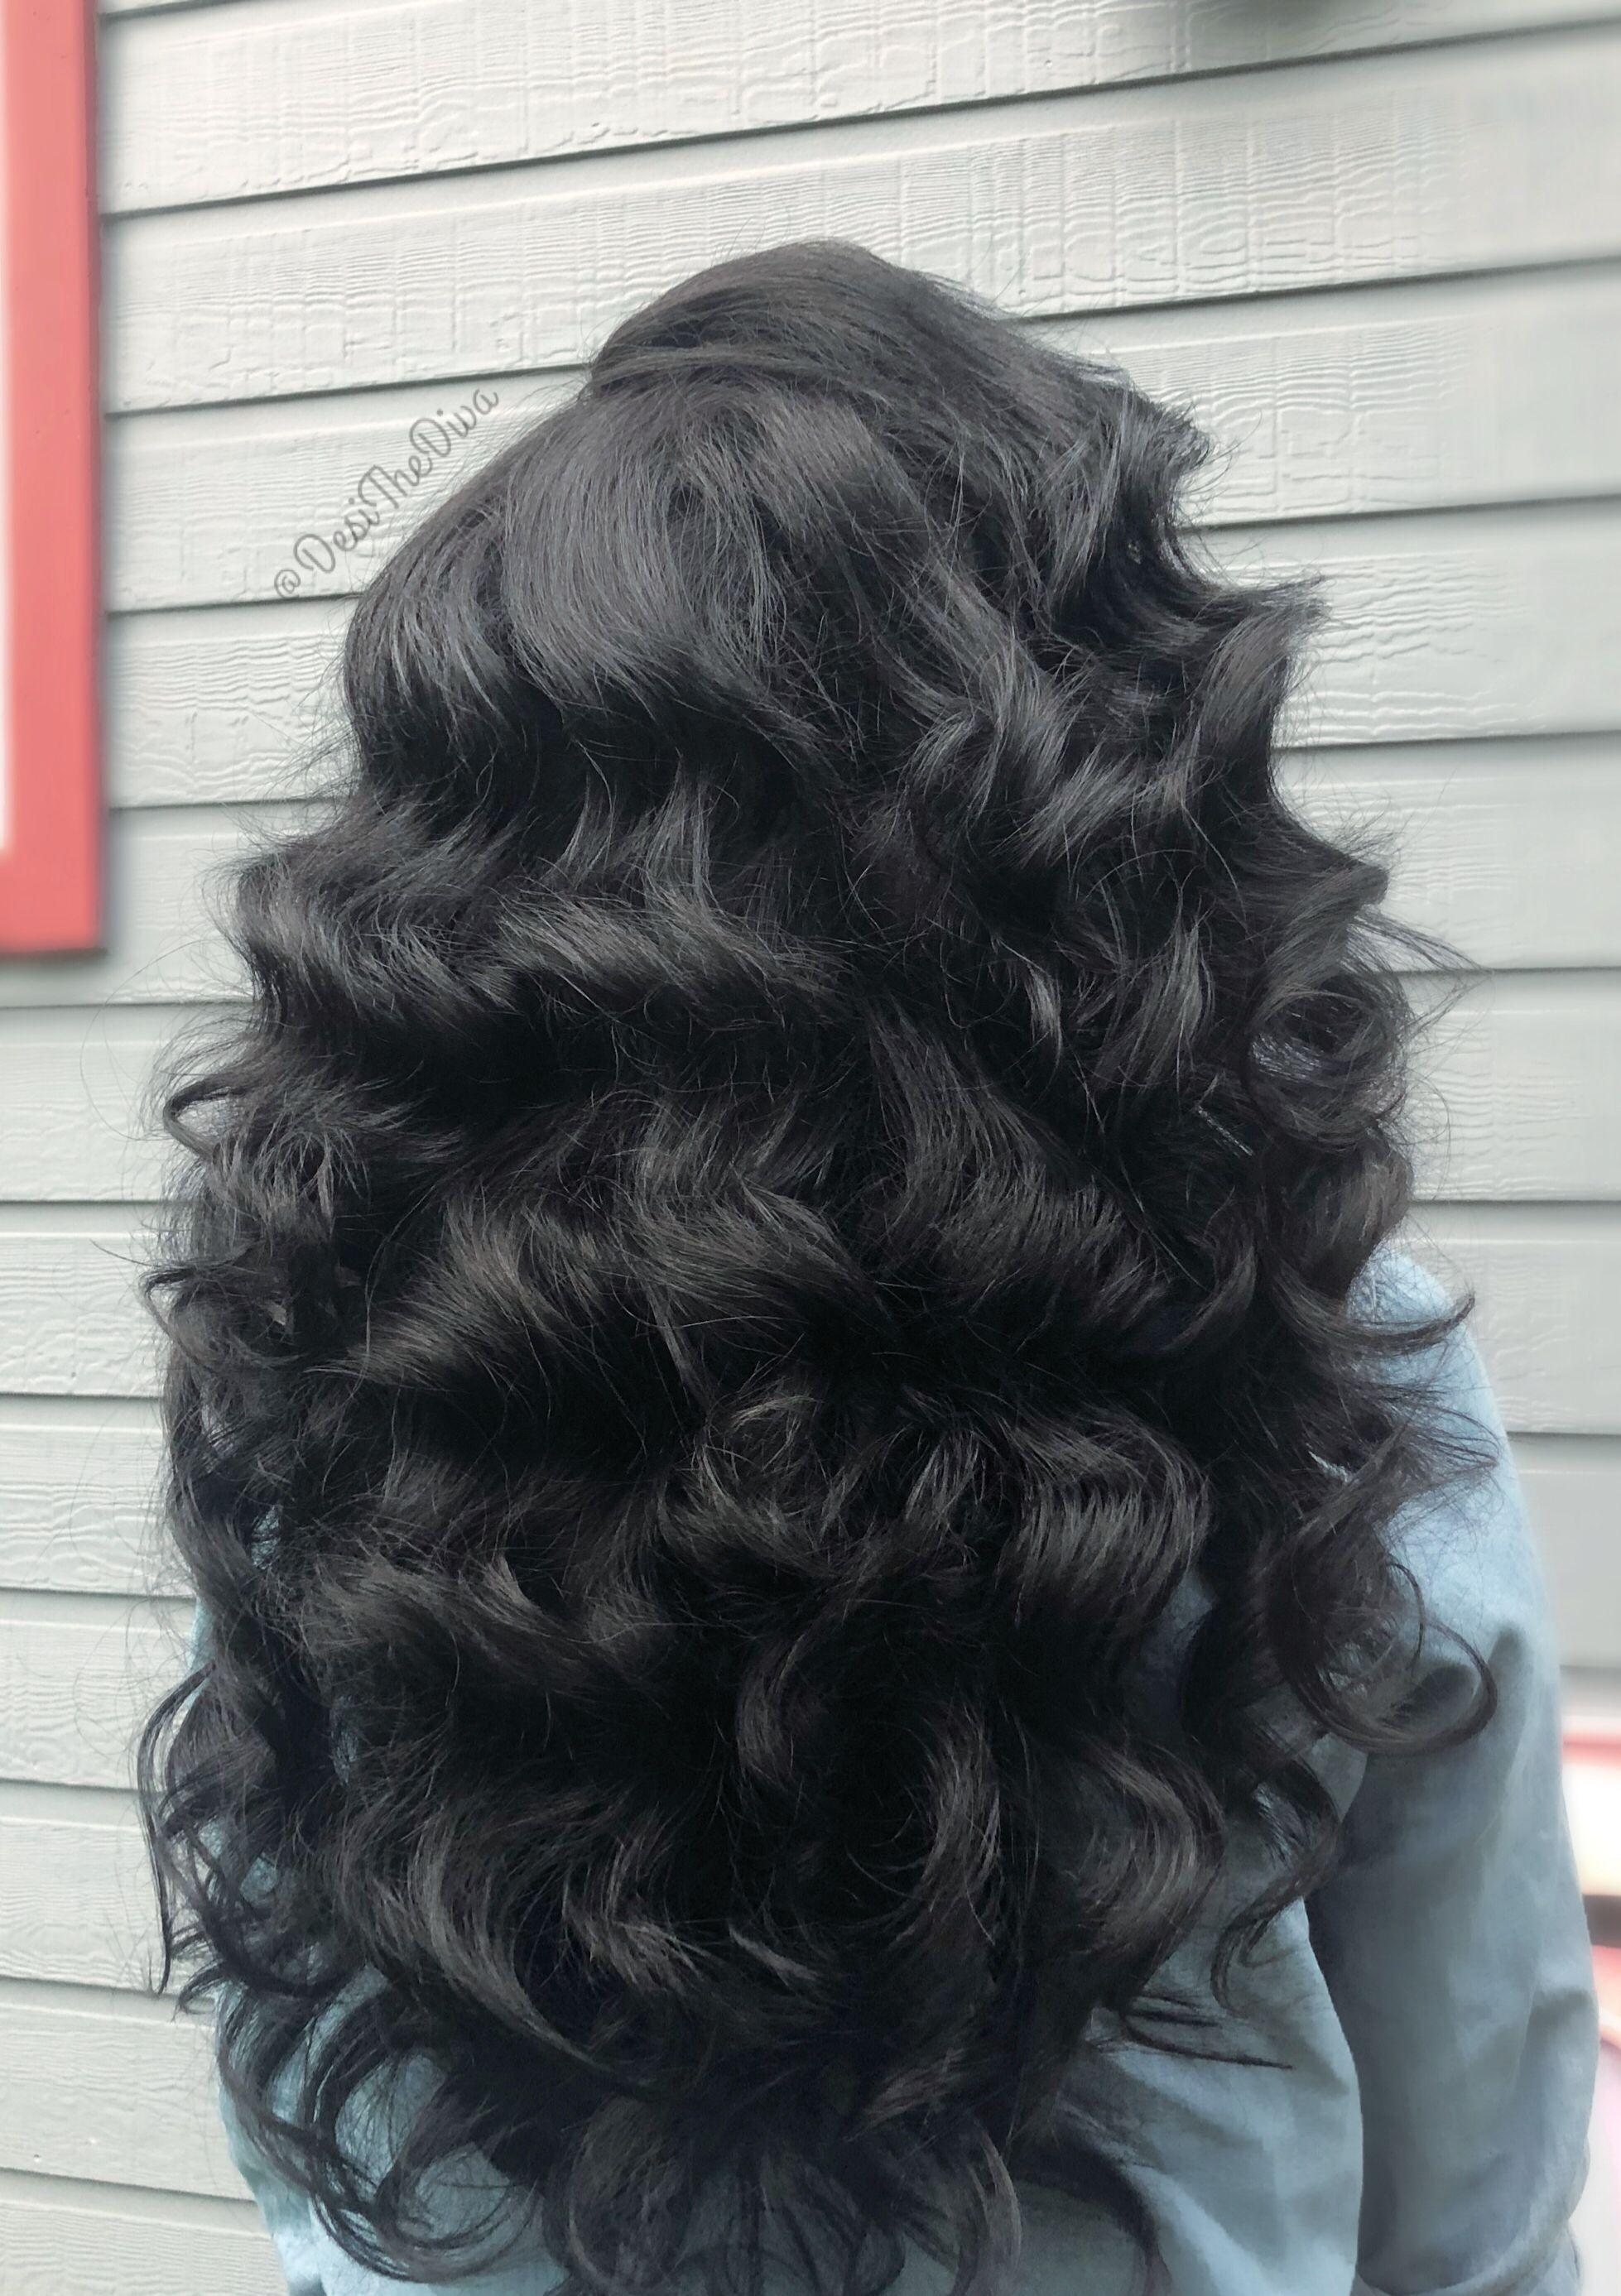 Big Super Model Hair Model hair, Celebrity hair stylist